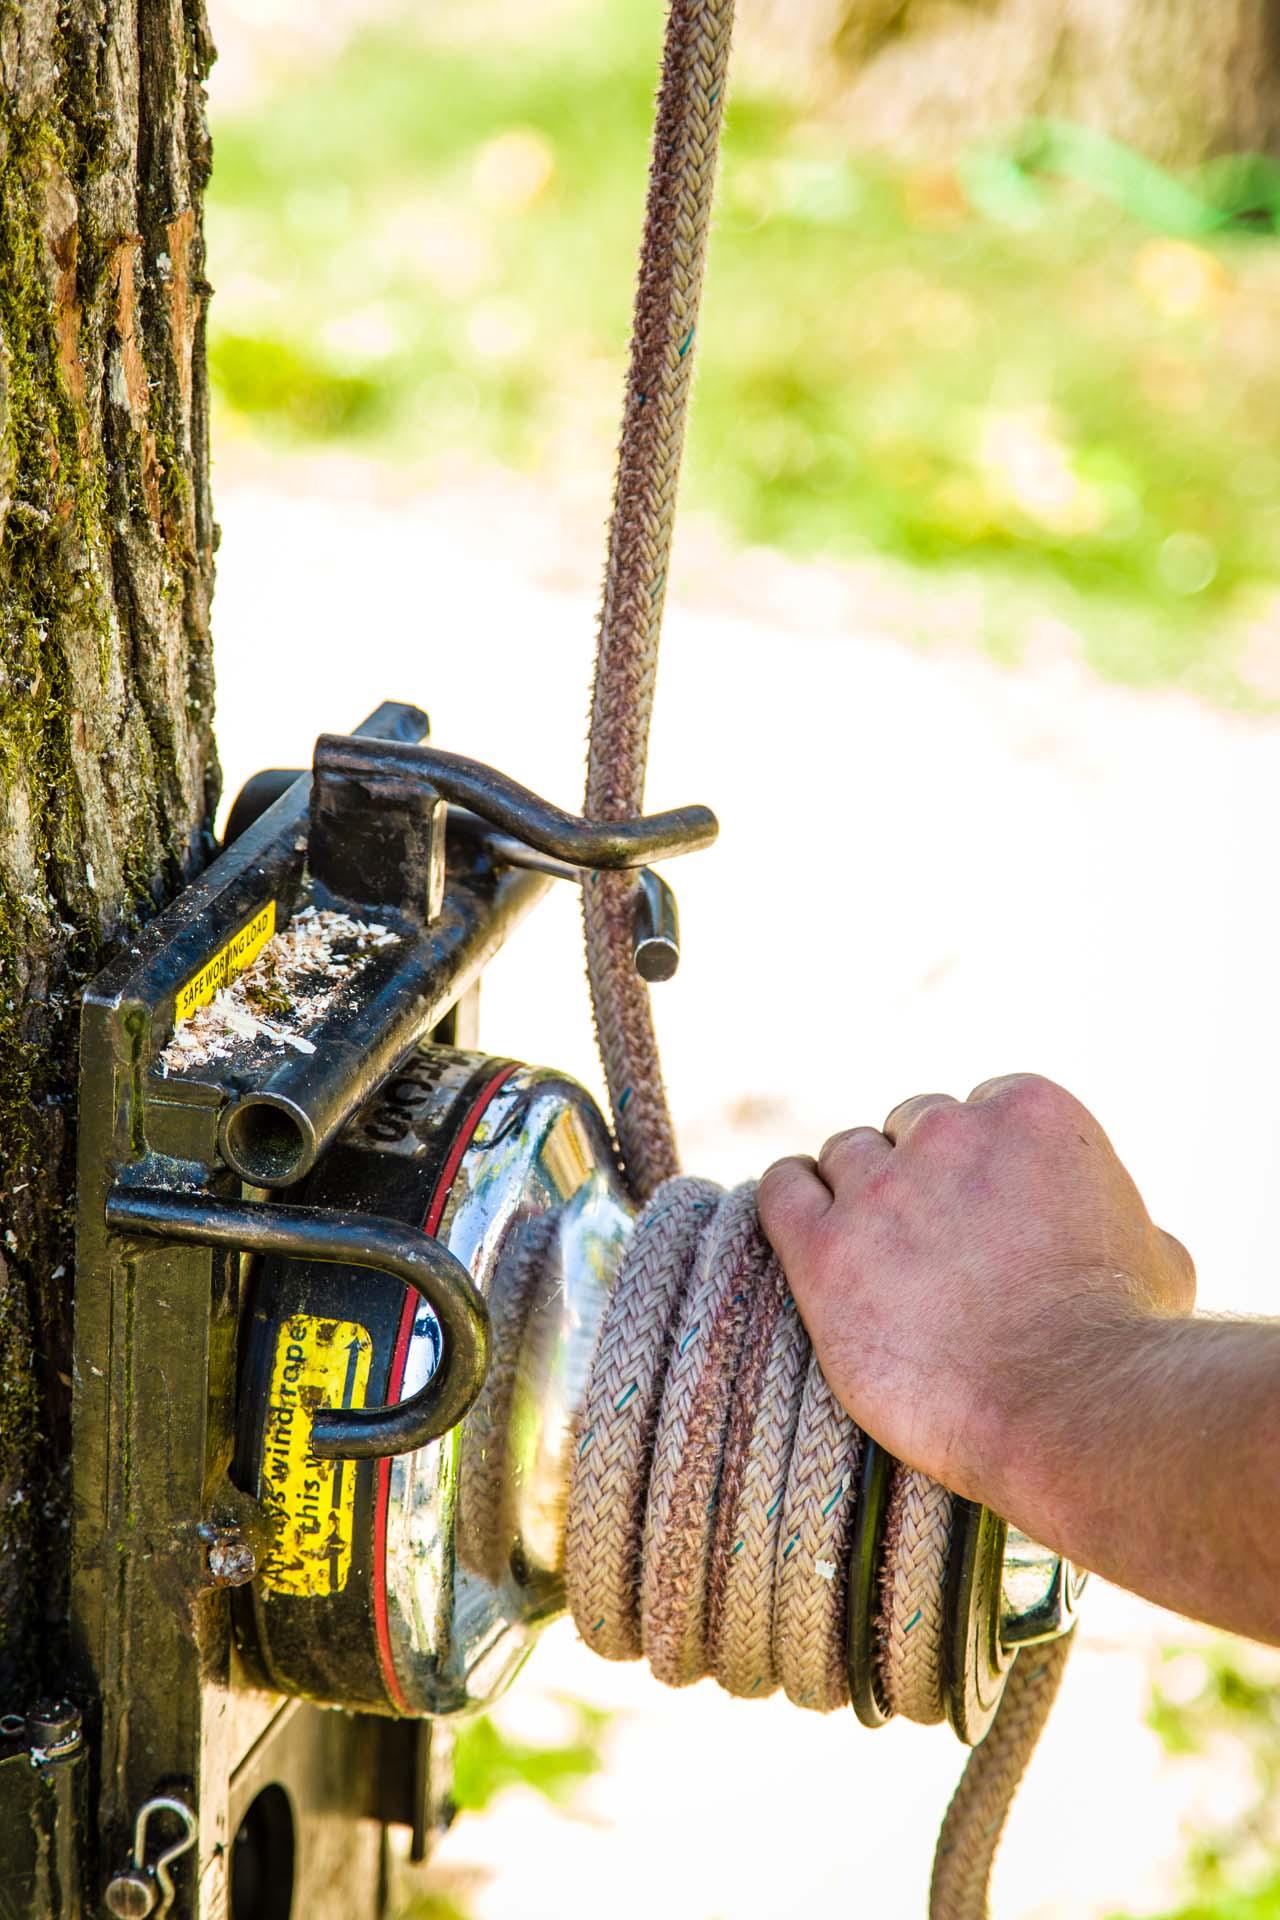 Proper Tree Cabling Equipment